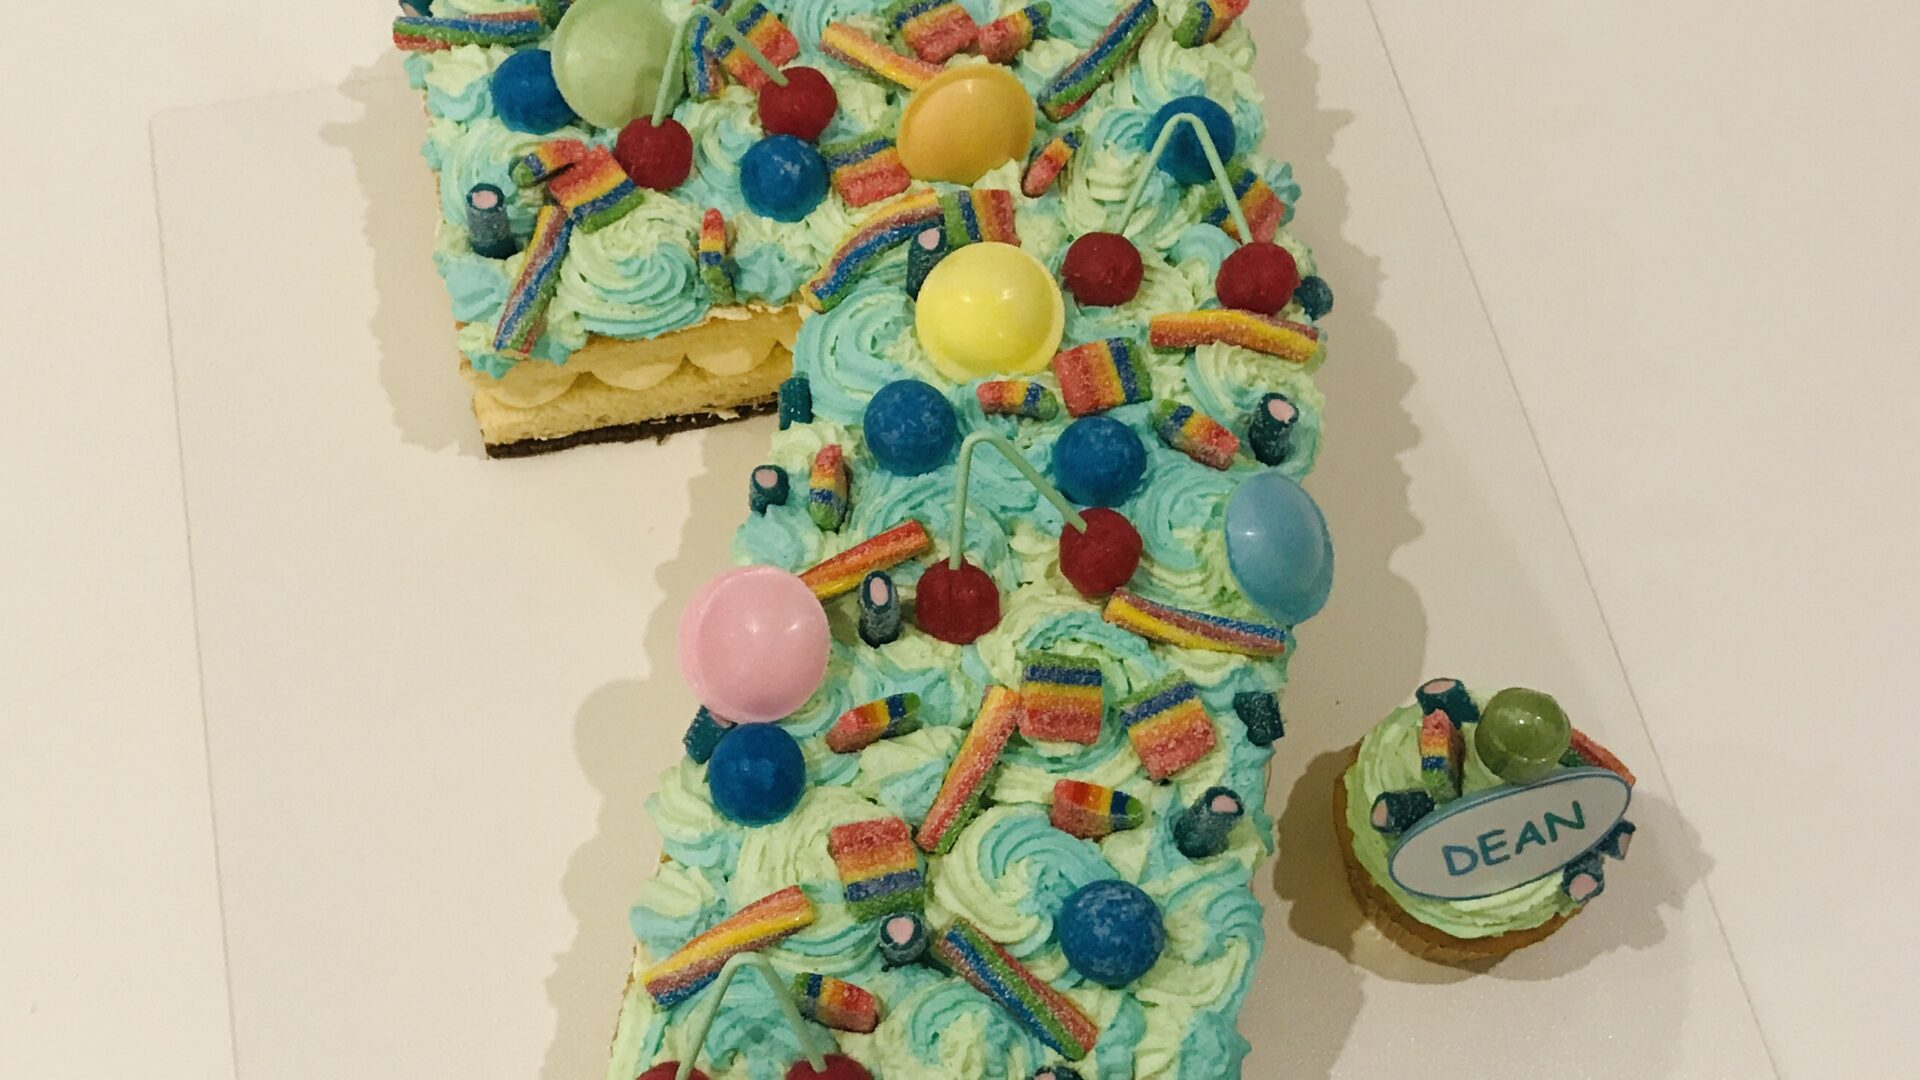 Cijfer 7 naked cake DEAN